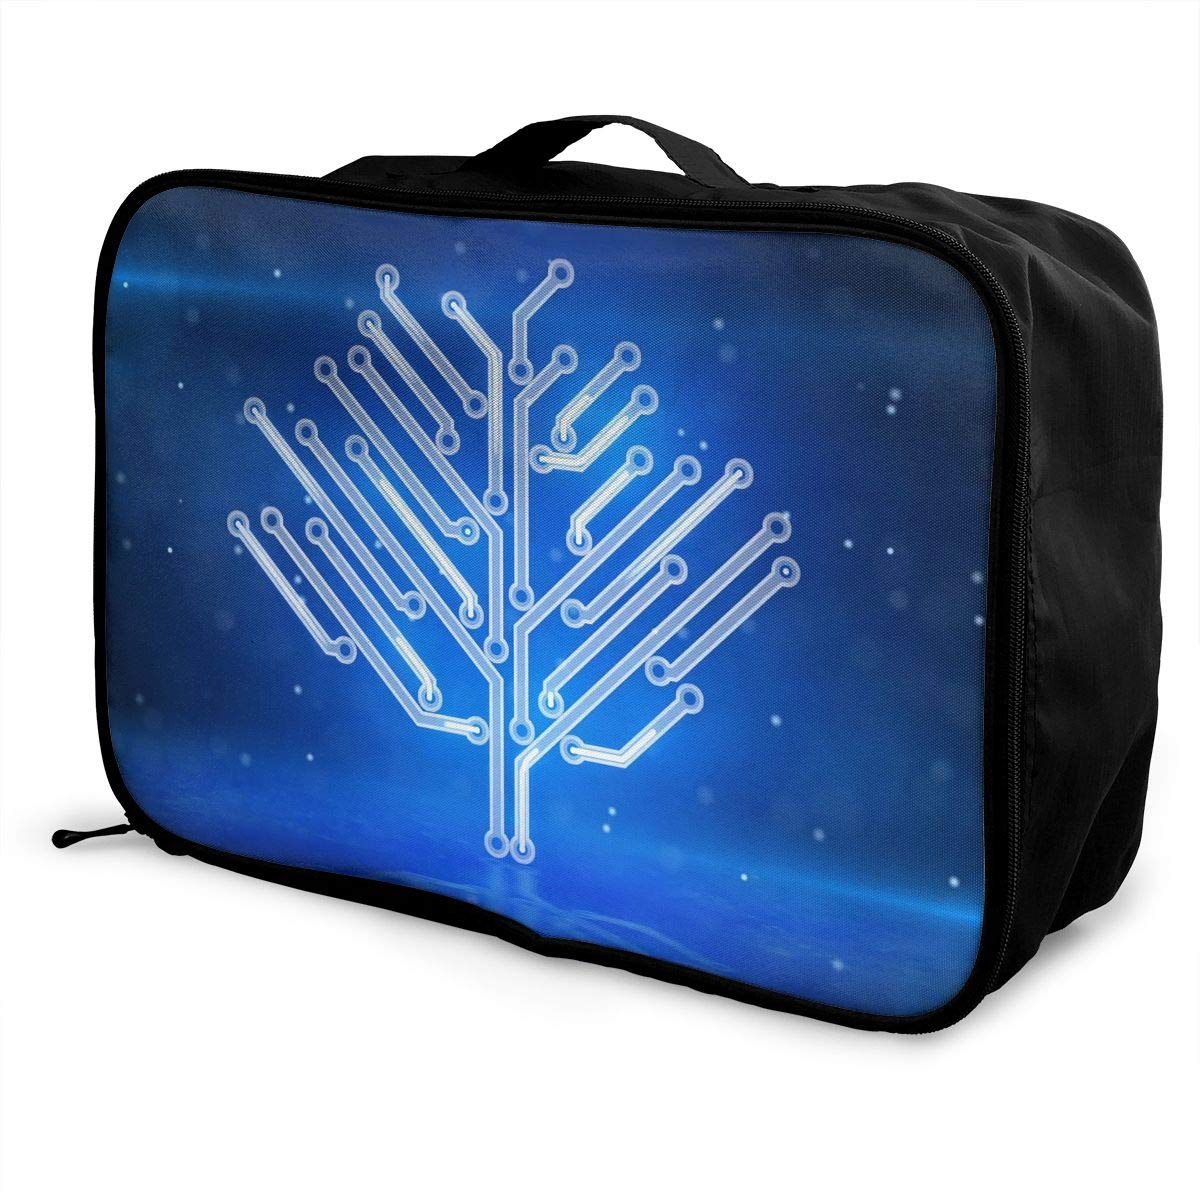 Travel Luggage Duffle Bag Lightweight Portable Handbag Blue Circuit Pattern Large Capacity Waterproof Foldable Storage Tote